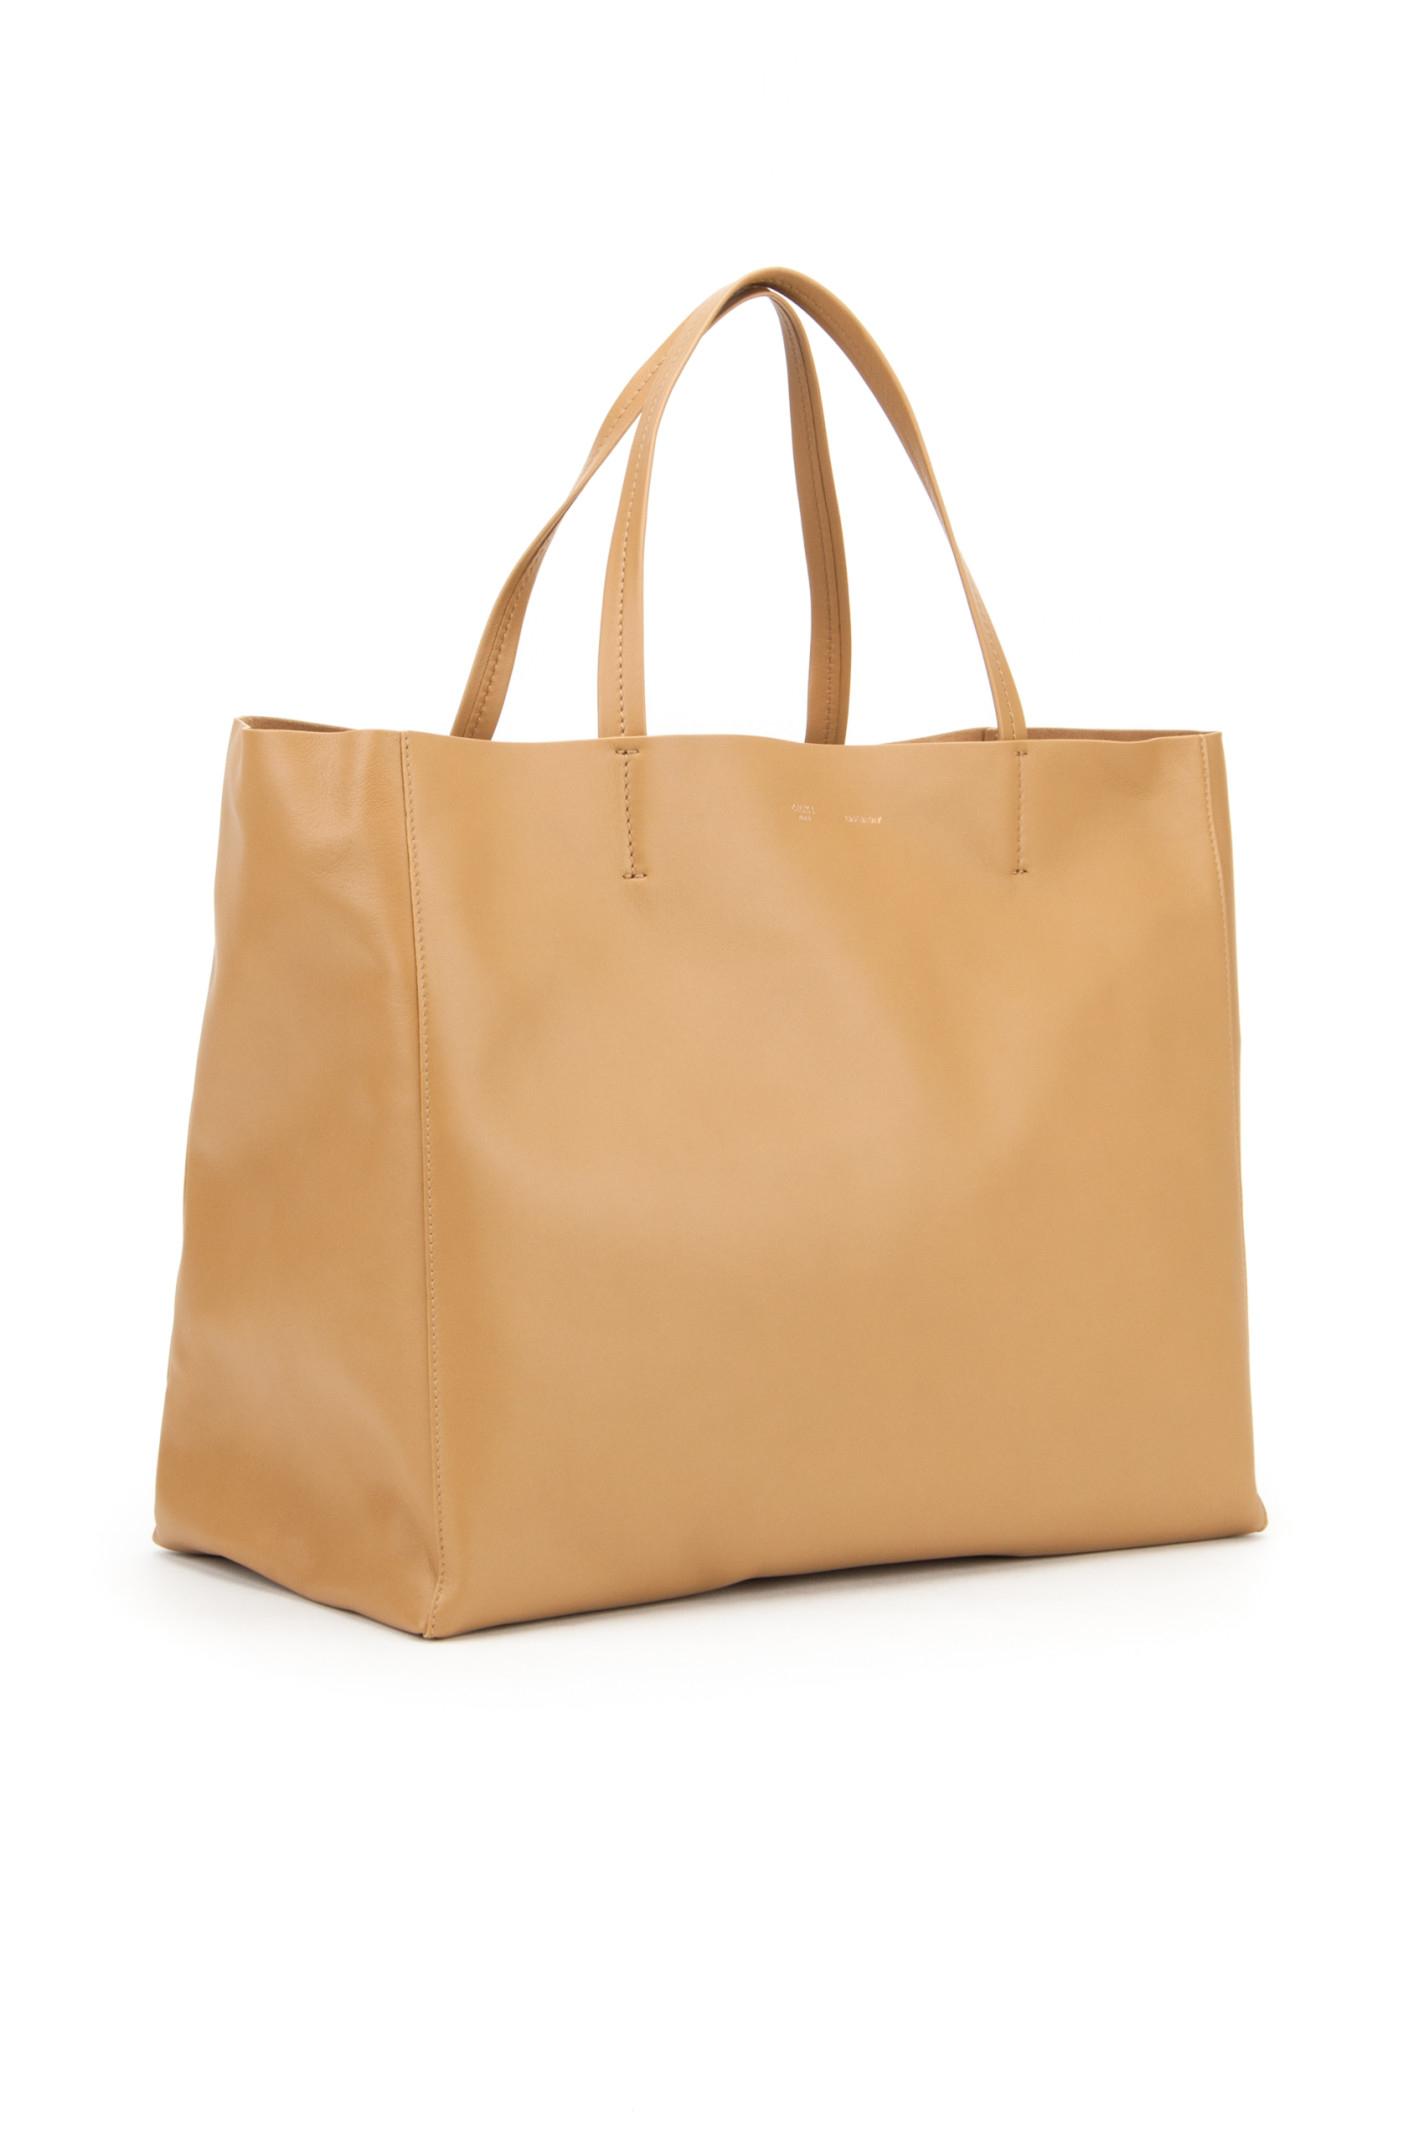 C¨¦line Horizontal Bag in Beige (CAMEL)   Lyst